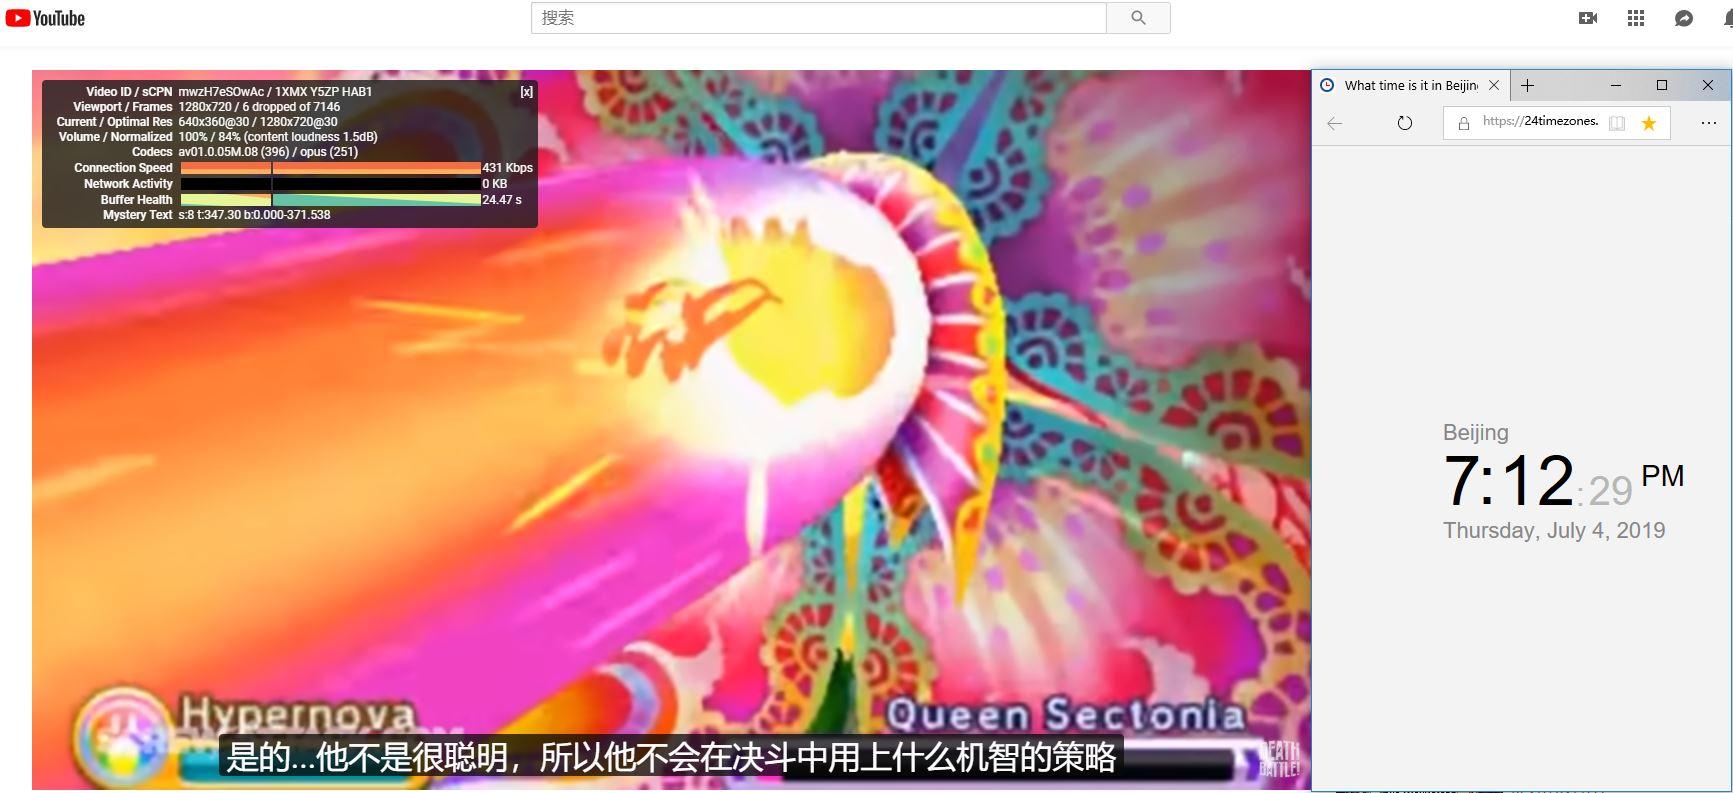 windows nordvpn 法国 331节点 中国VPN 翻墙 科学上网 YouTube测试-20190704